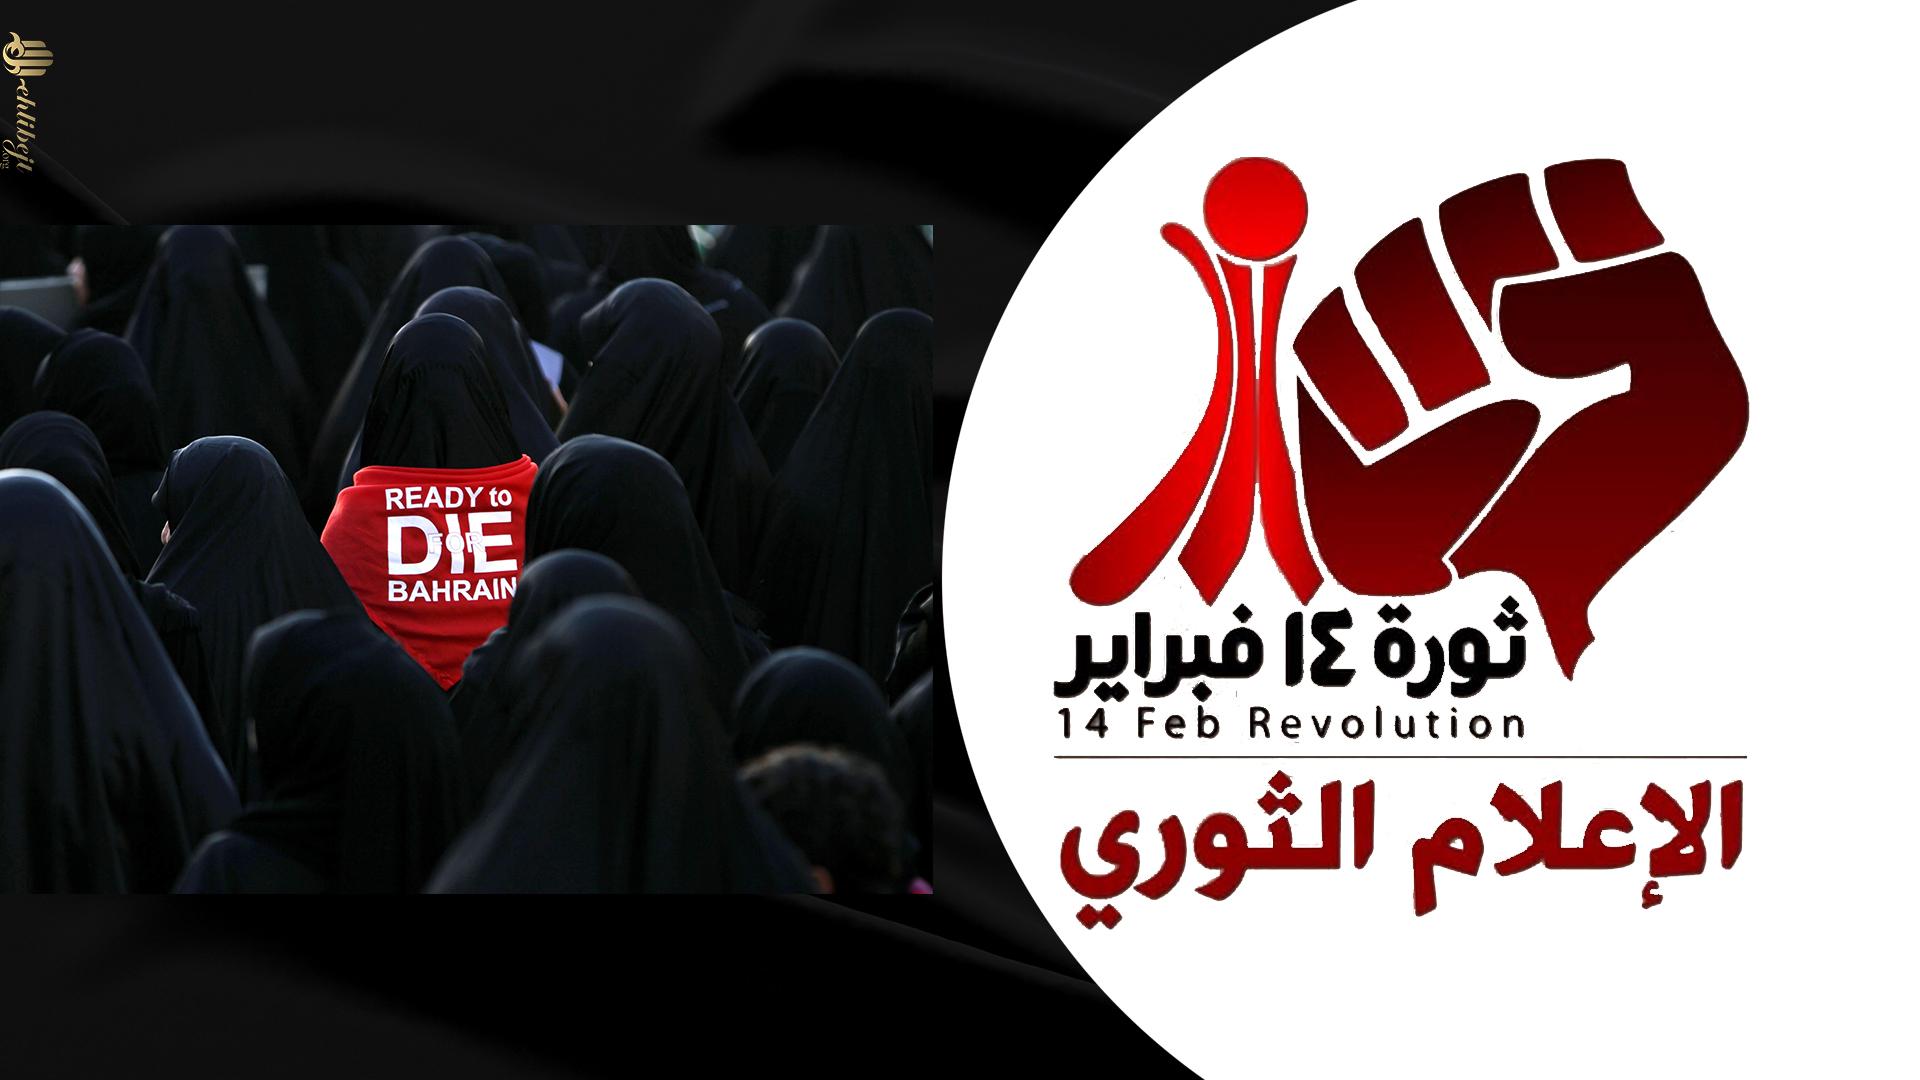 Osmogodišnja golgota bahreinskog naroda